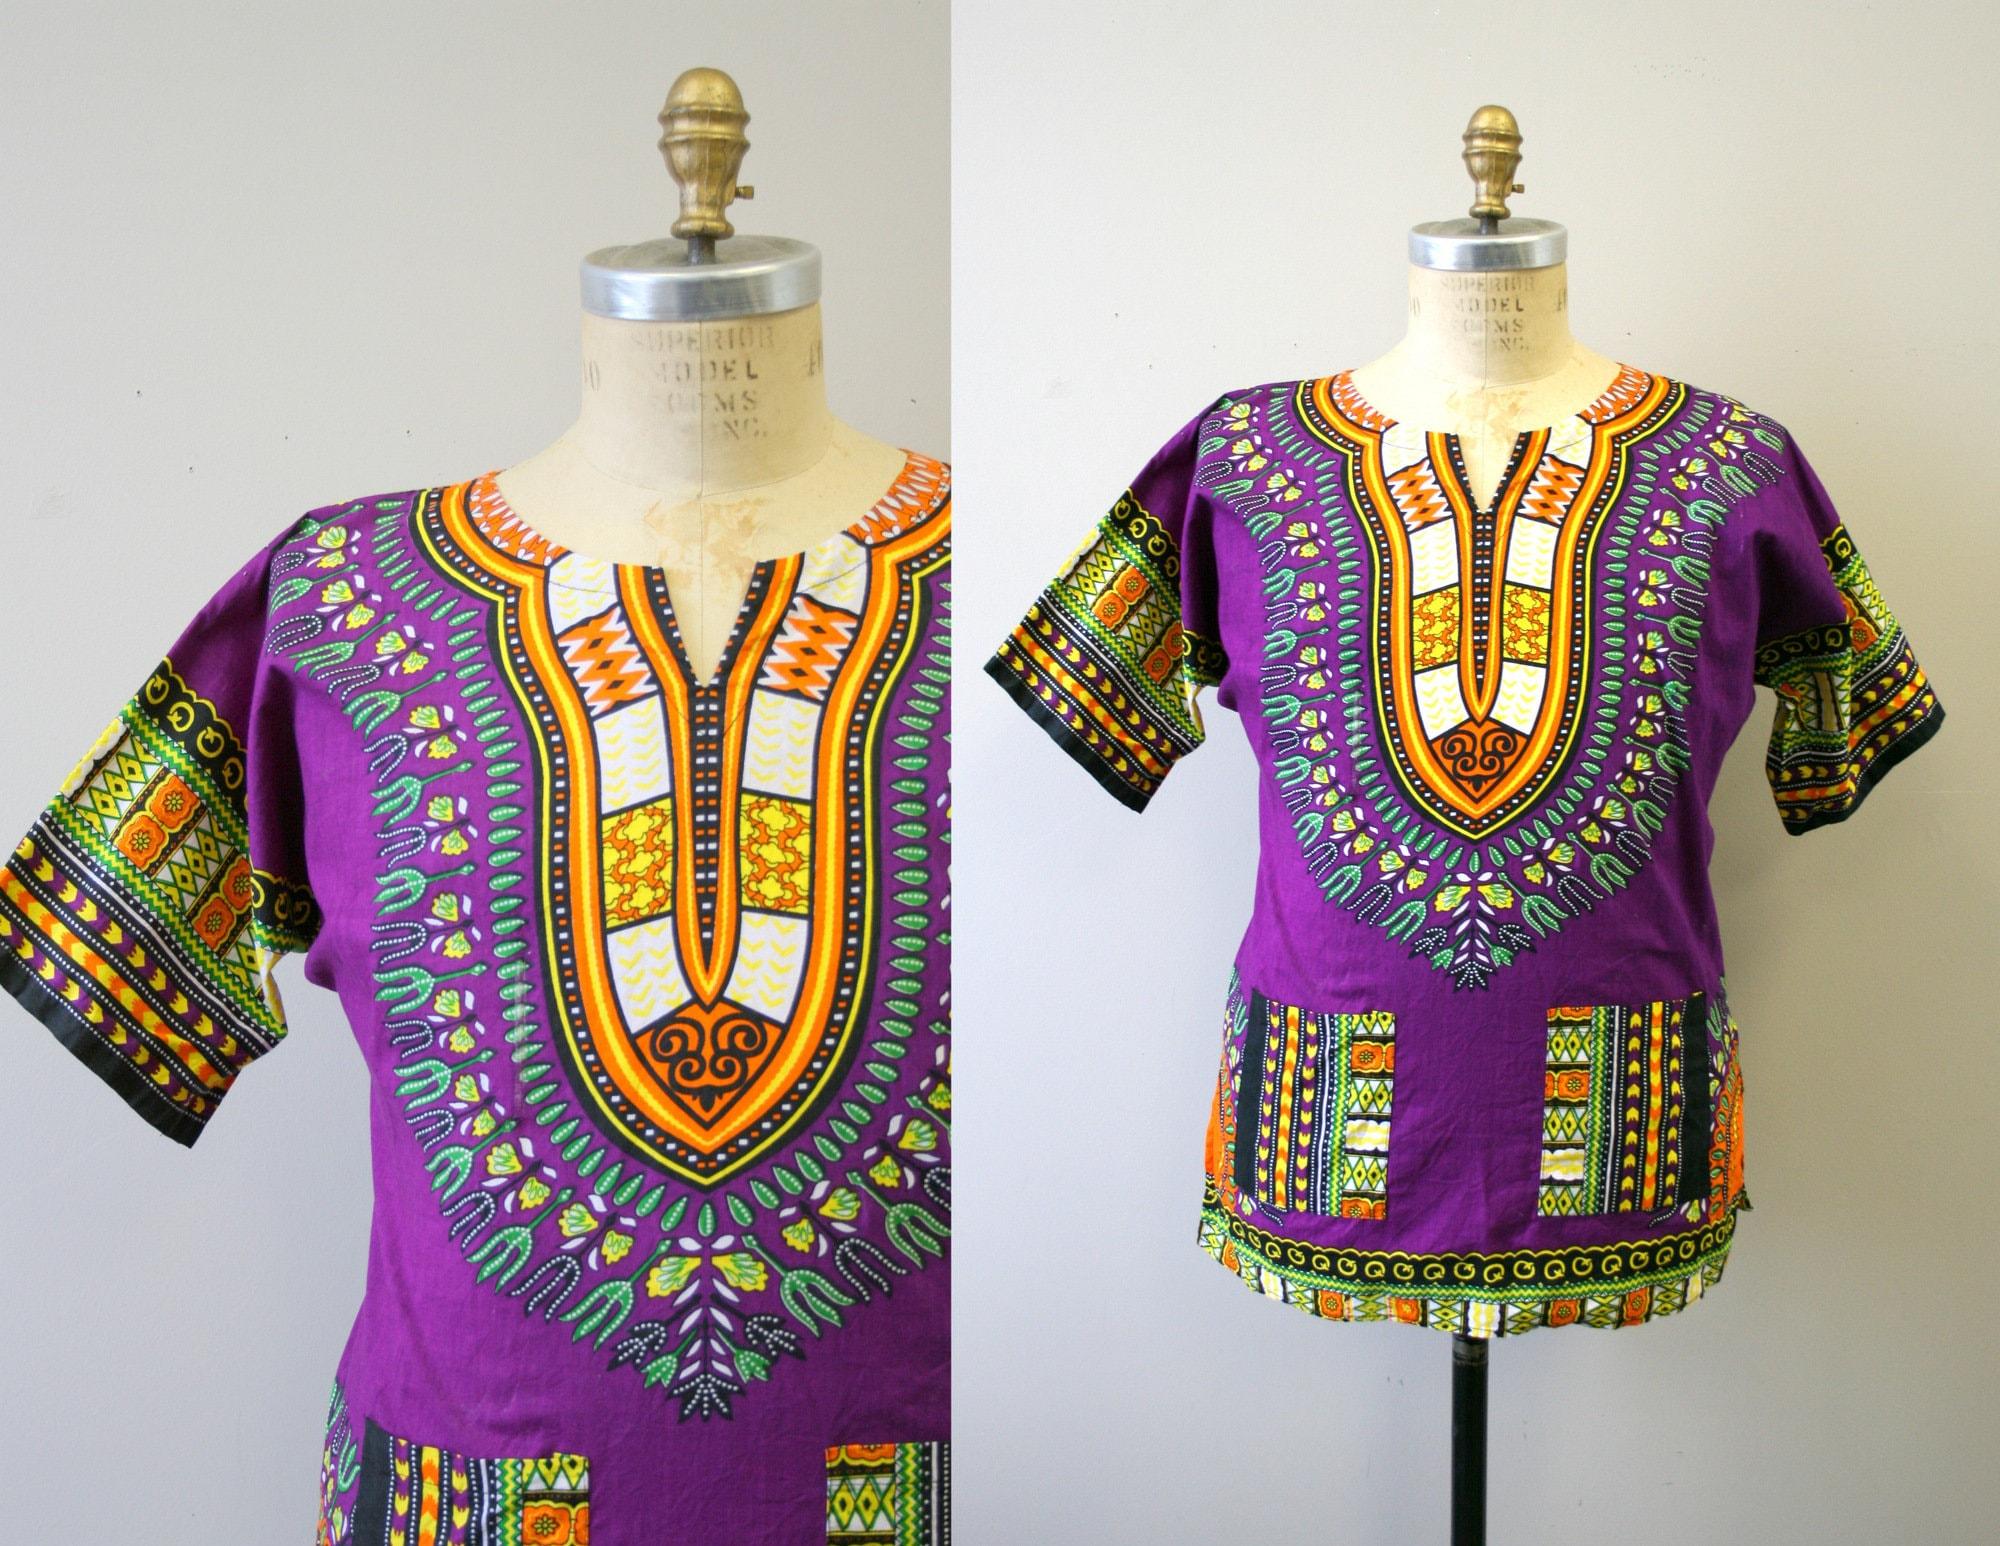 80s Tops, Shirts, T-shirts, Blouse   90s T-shirts 1980S Purple Dashiki $24.00 AT vintagedancer.com